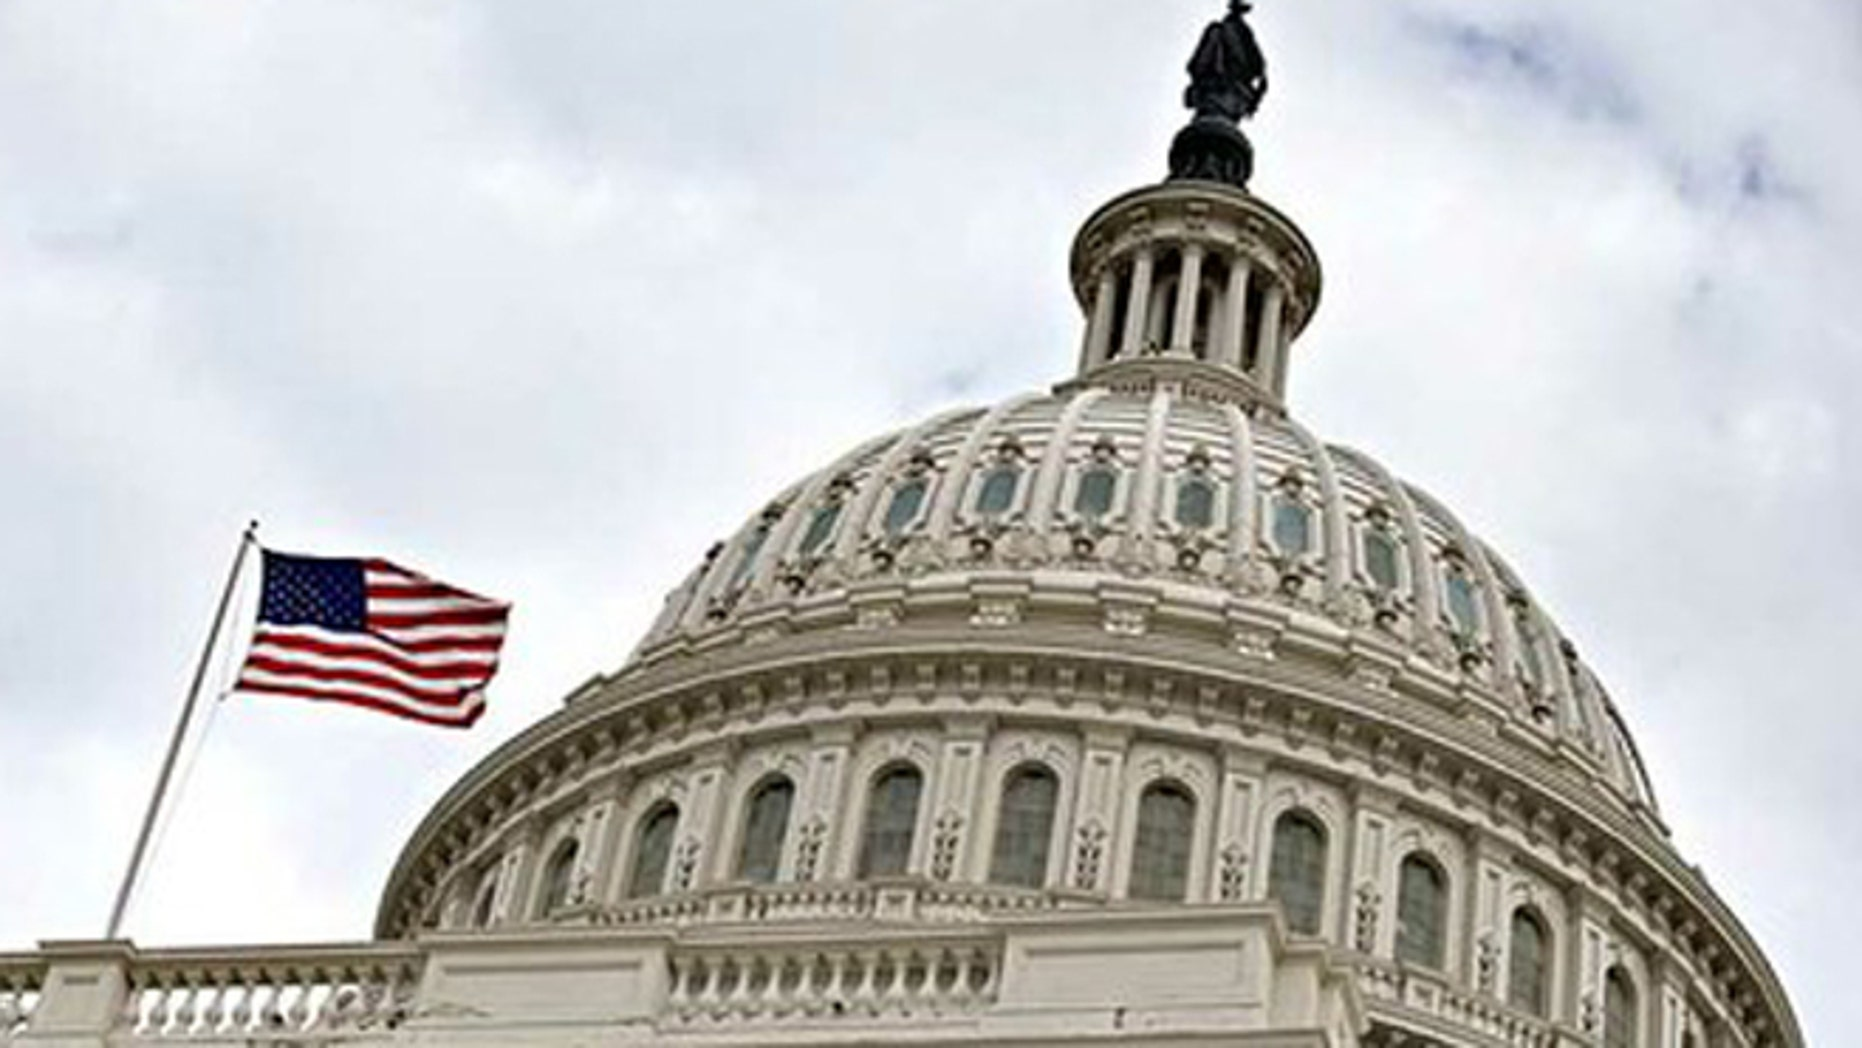 Capitol. Washington, D.C.